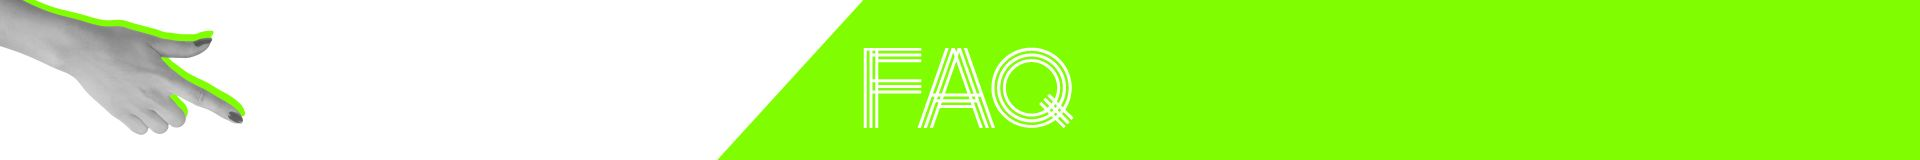 FAQ - Preguntas Frecuentes de Cataliza Canarias 2019 - Cabecera